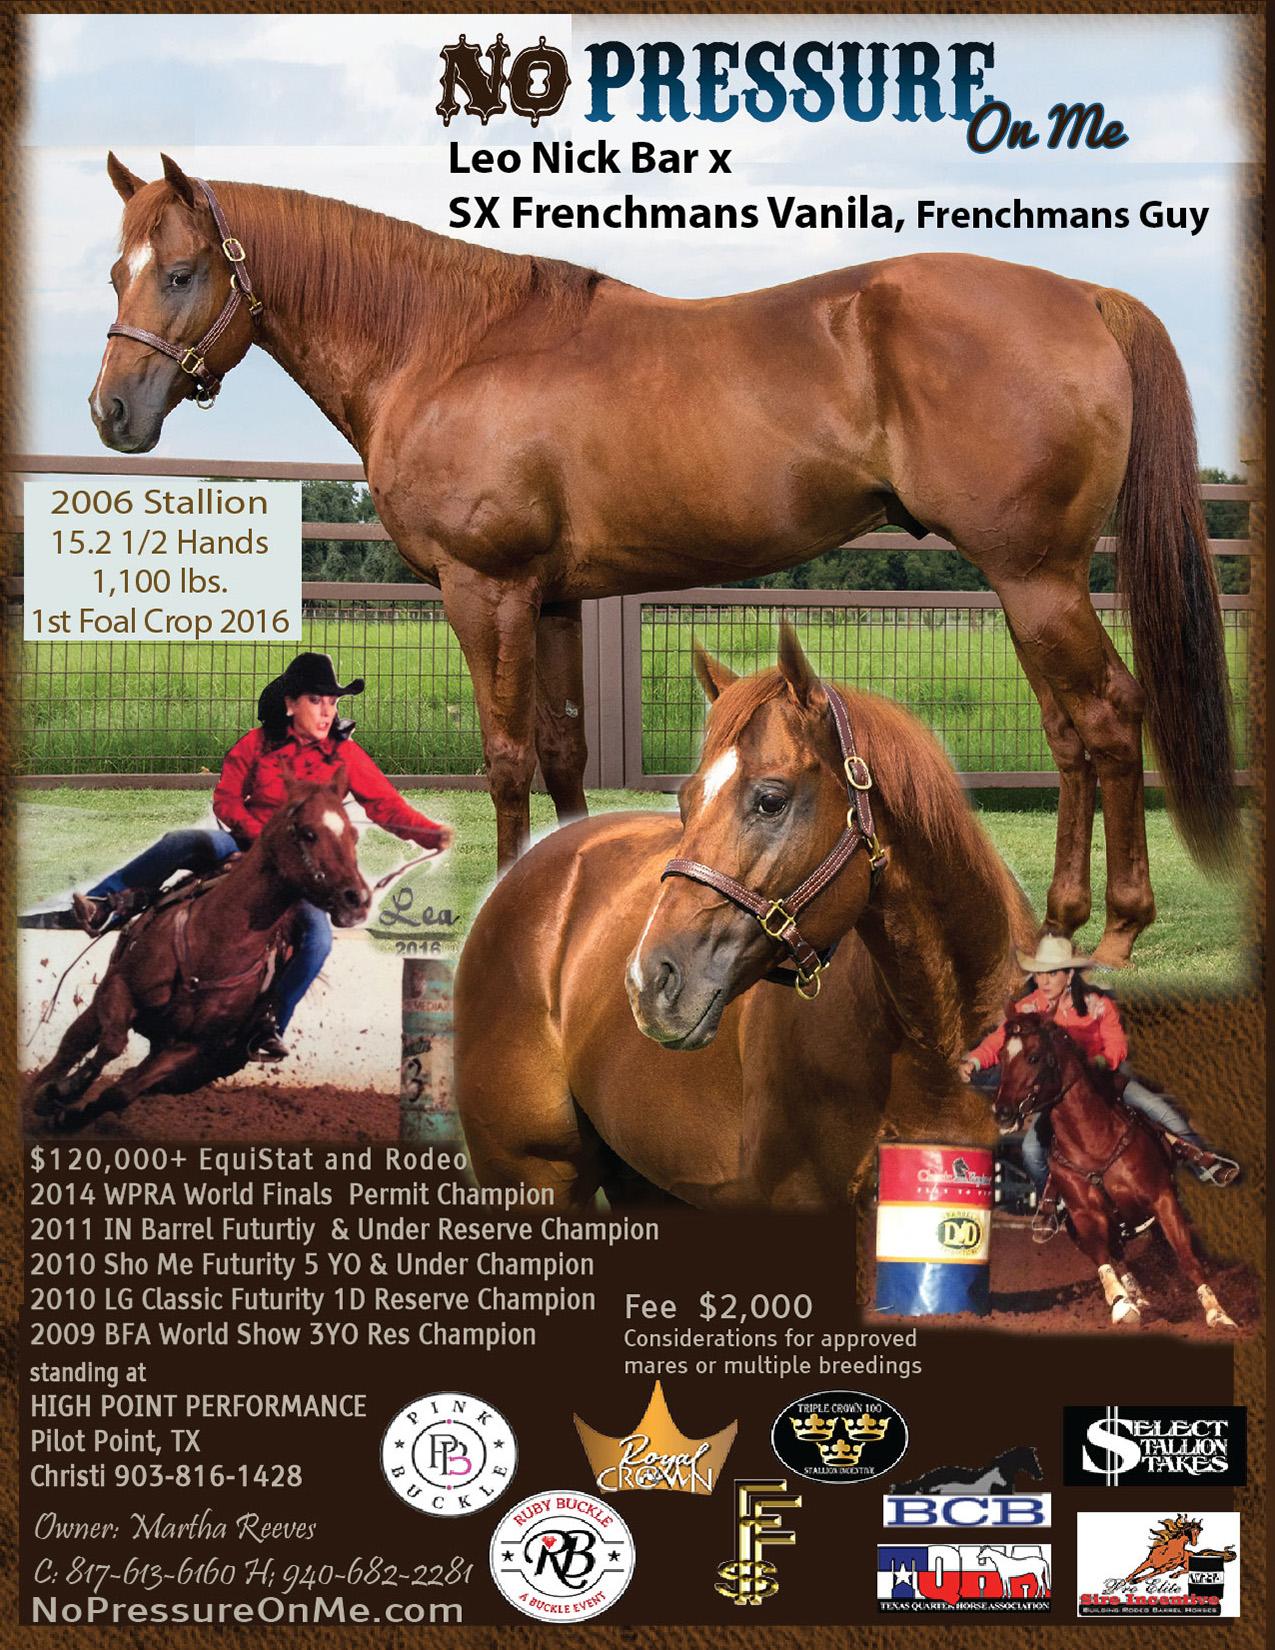 https://performancehorsehotline.com/horses-2020/605/Rooster2020-08-25-HighPoint.jpg